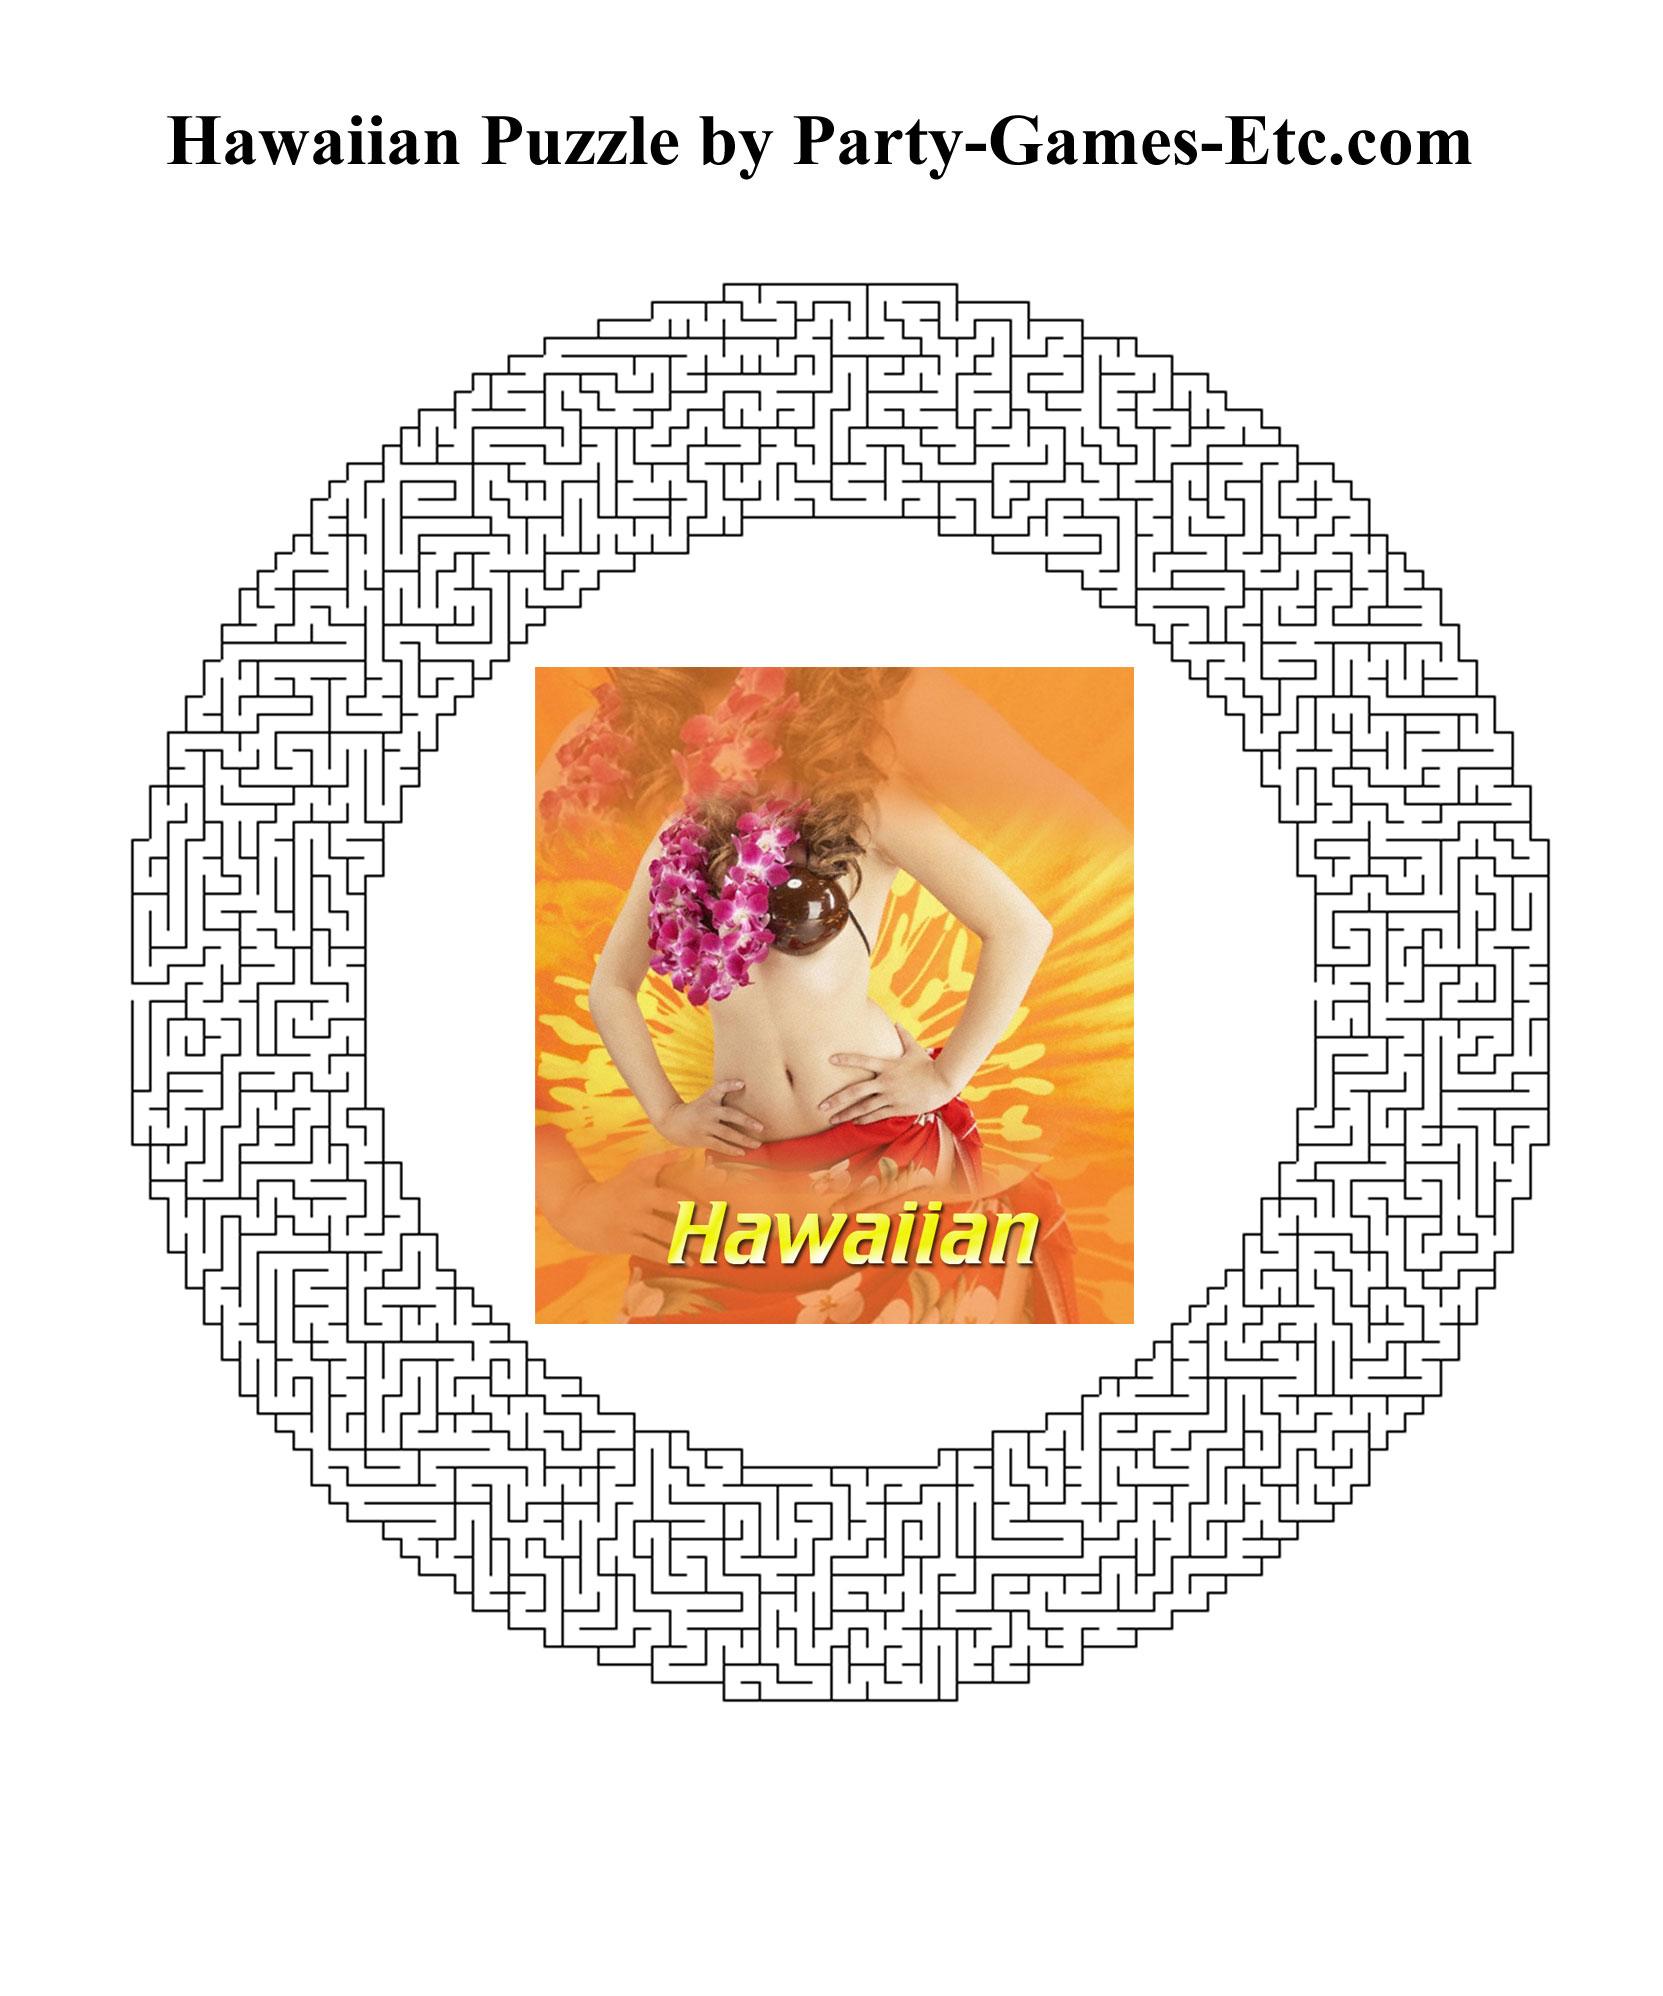 Free Printable Memory Games With Hawaiian Theme 9jasports